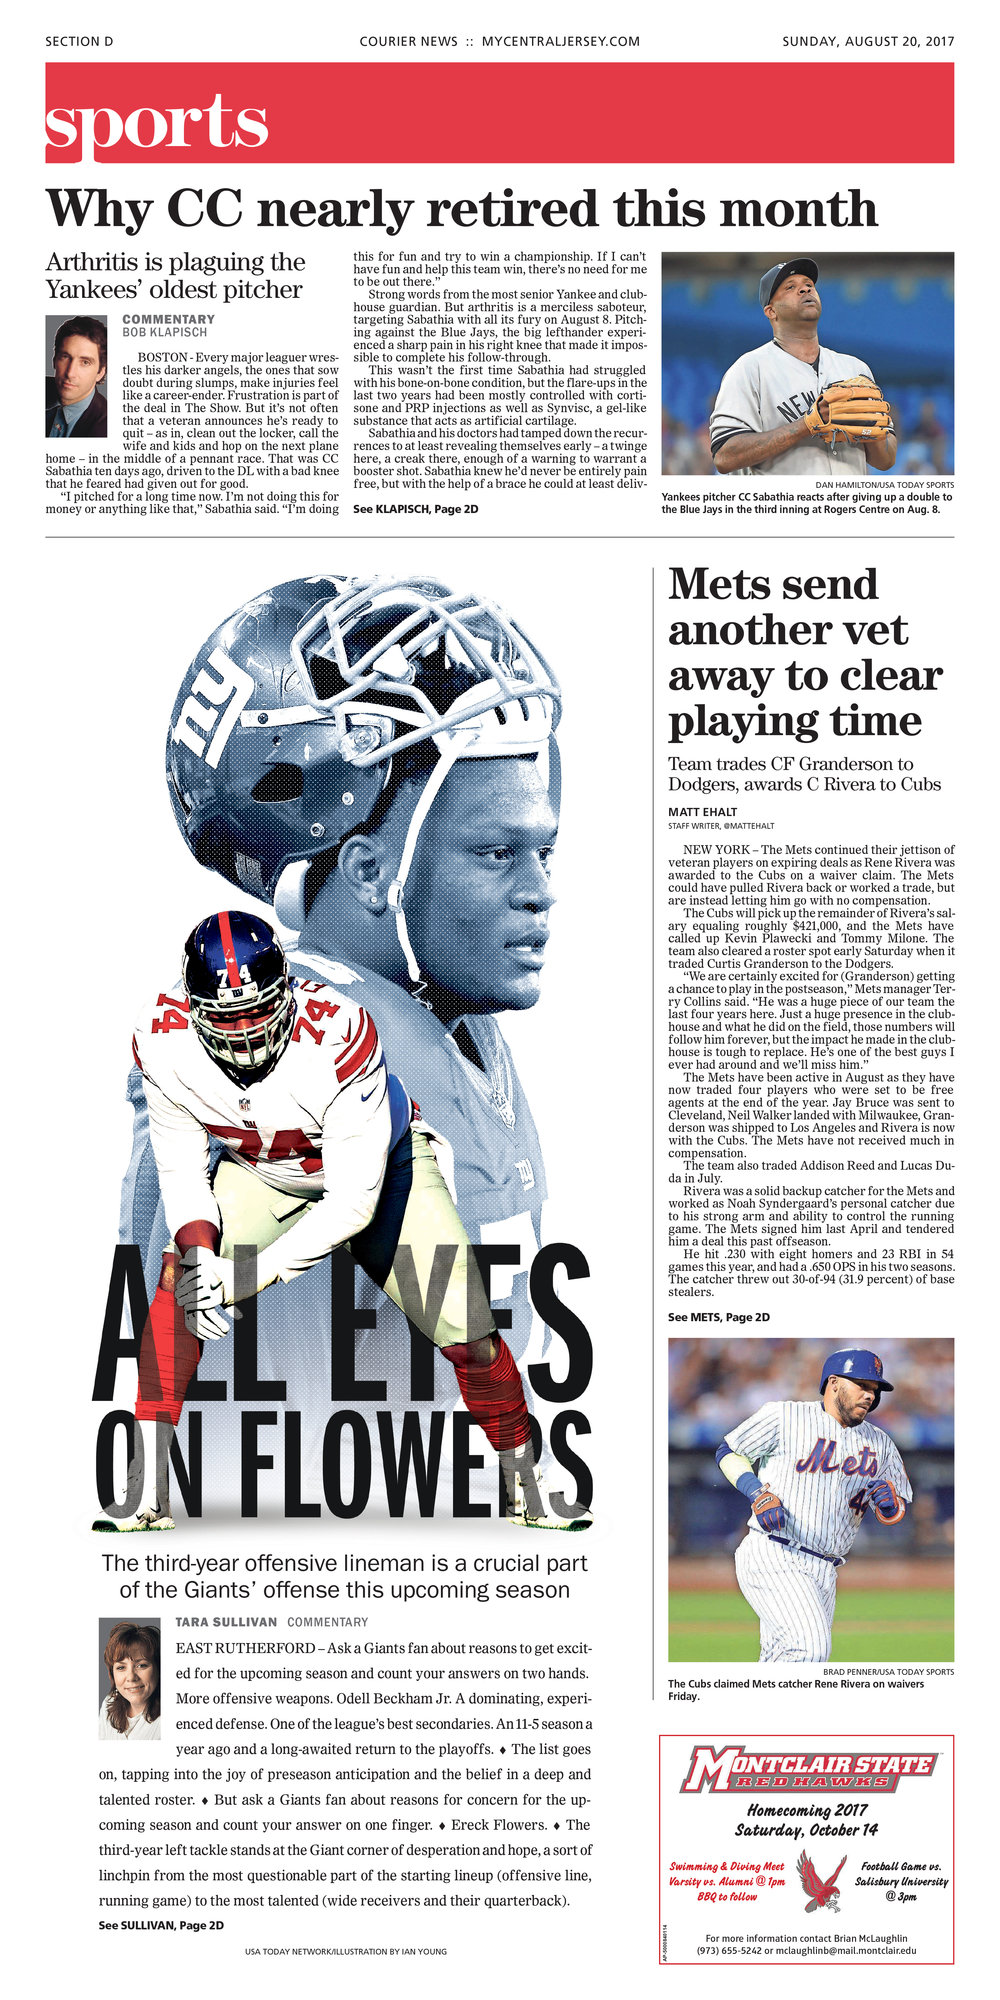 Sports-Cov, BRIBrd 08-20-2017, Daily 1 - Sports.jpg